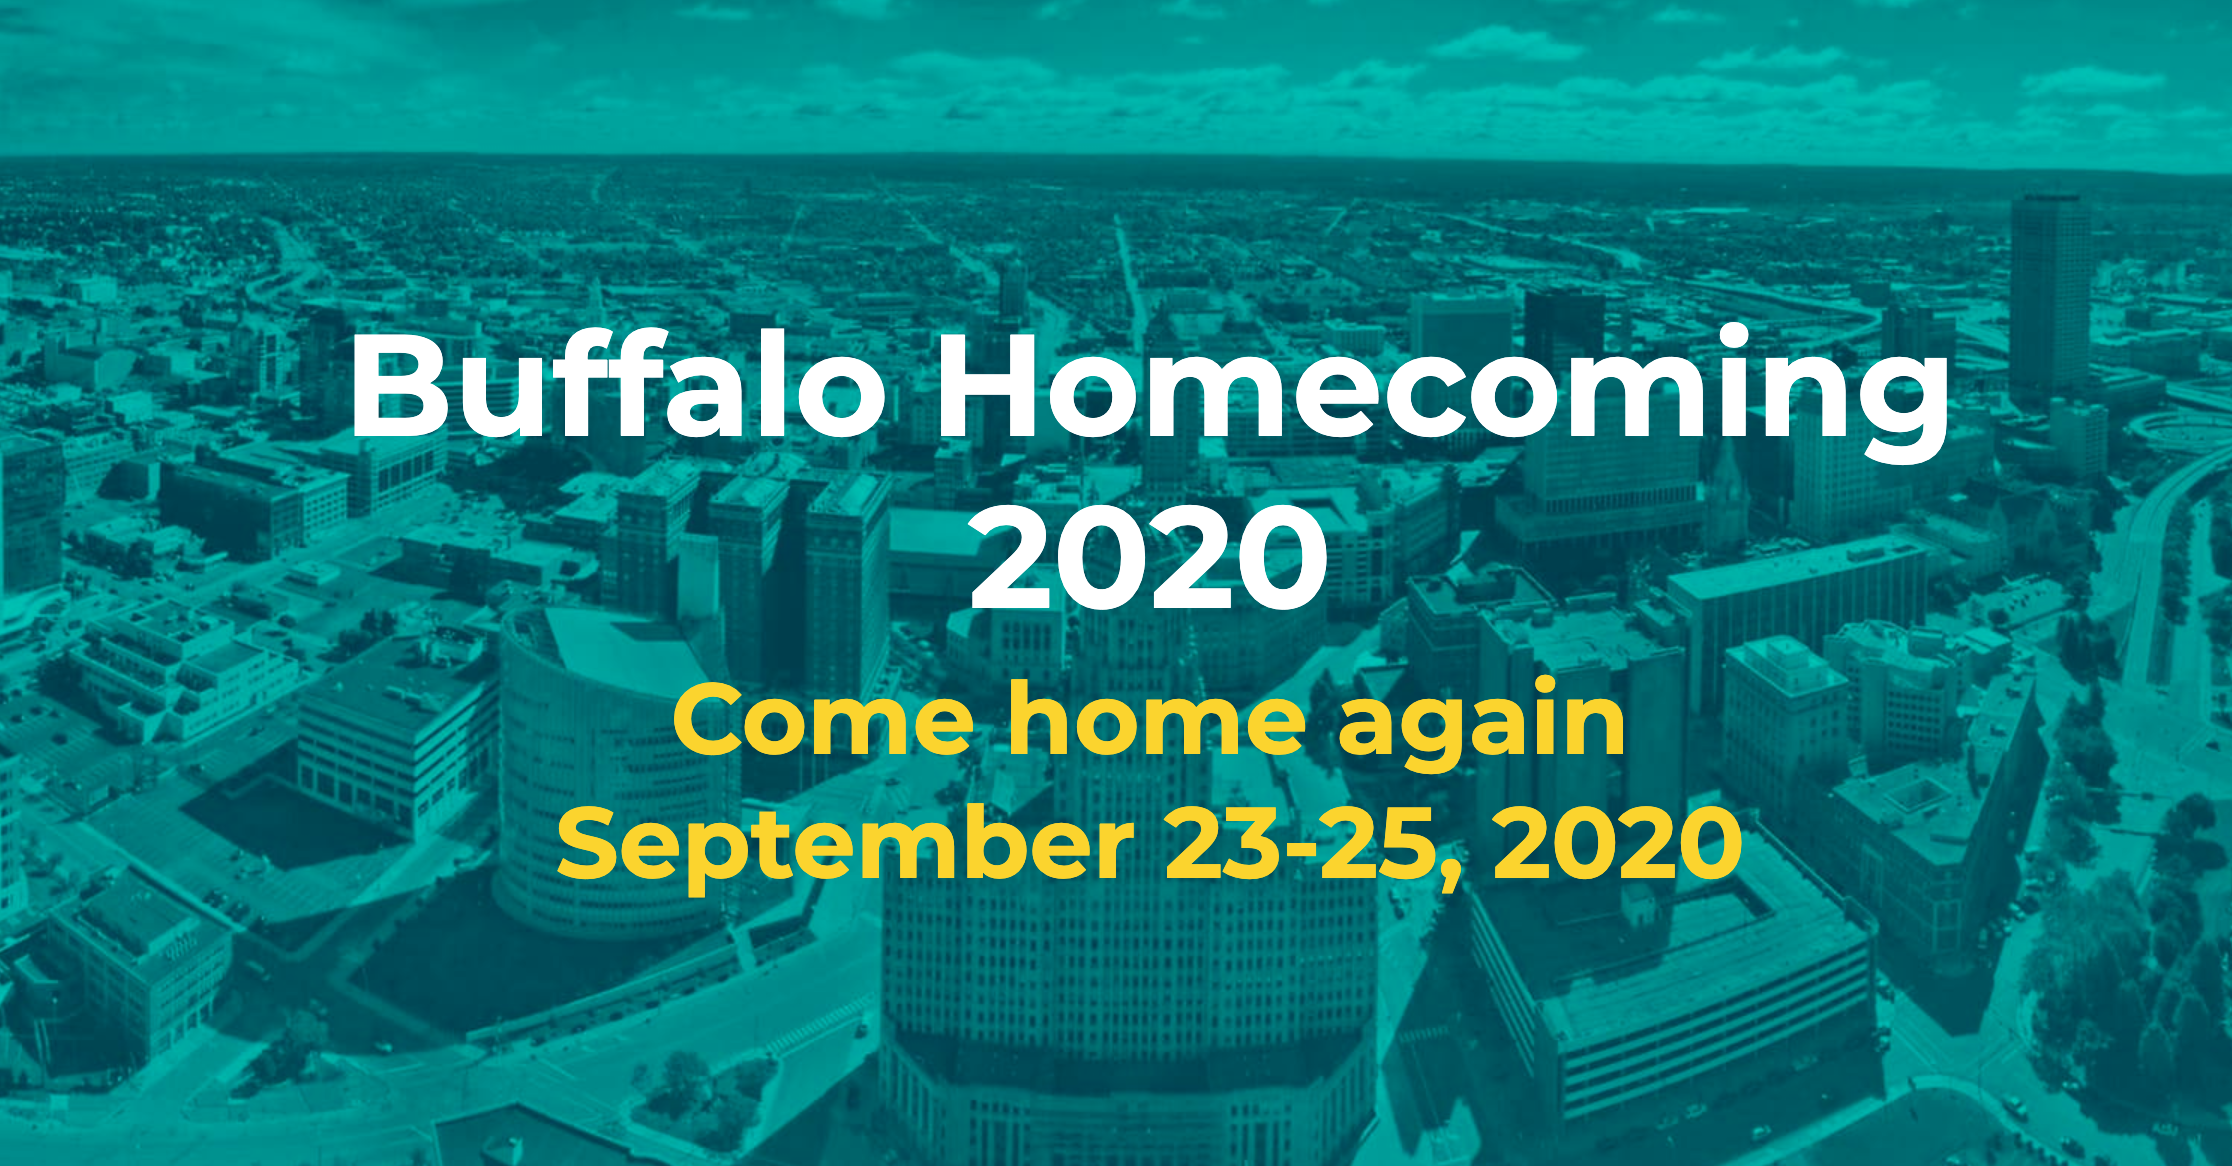 Buffalo Homecoming